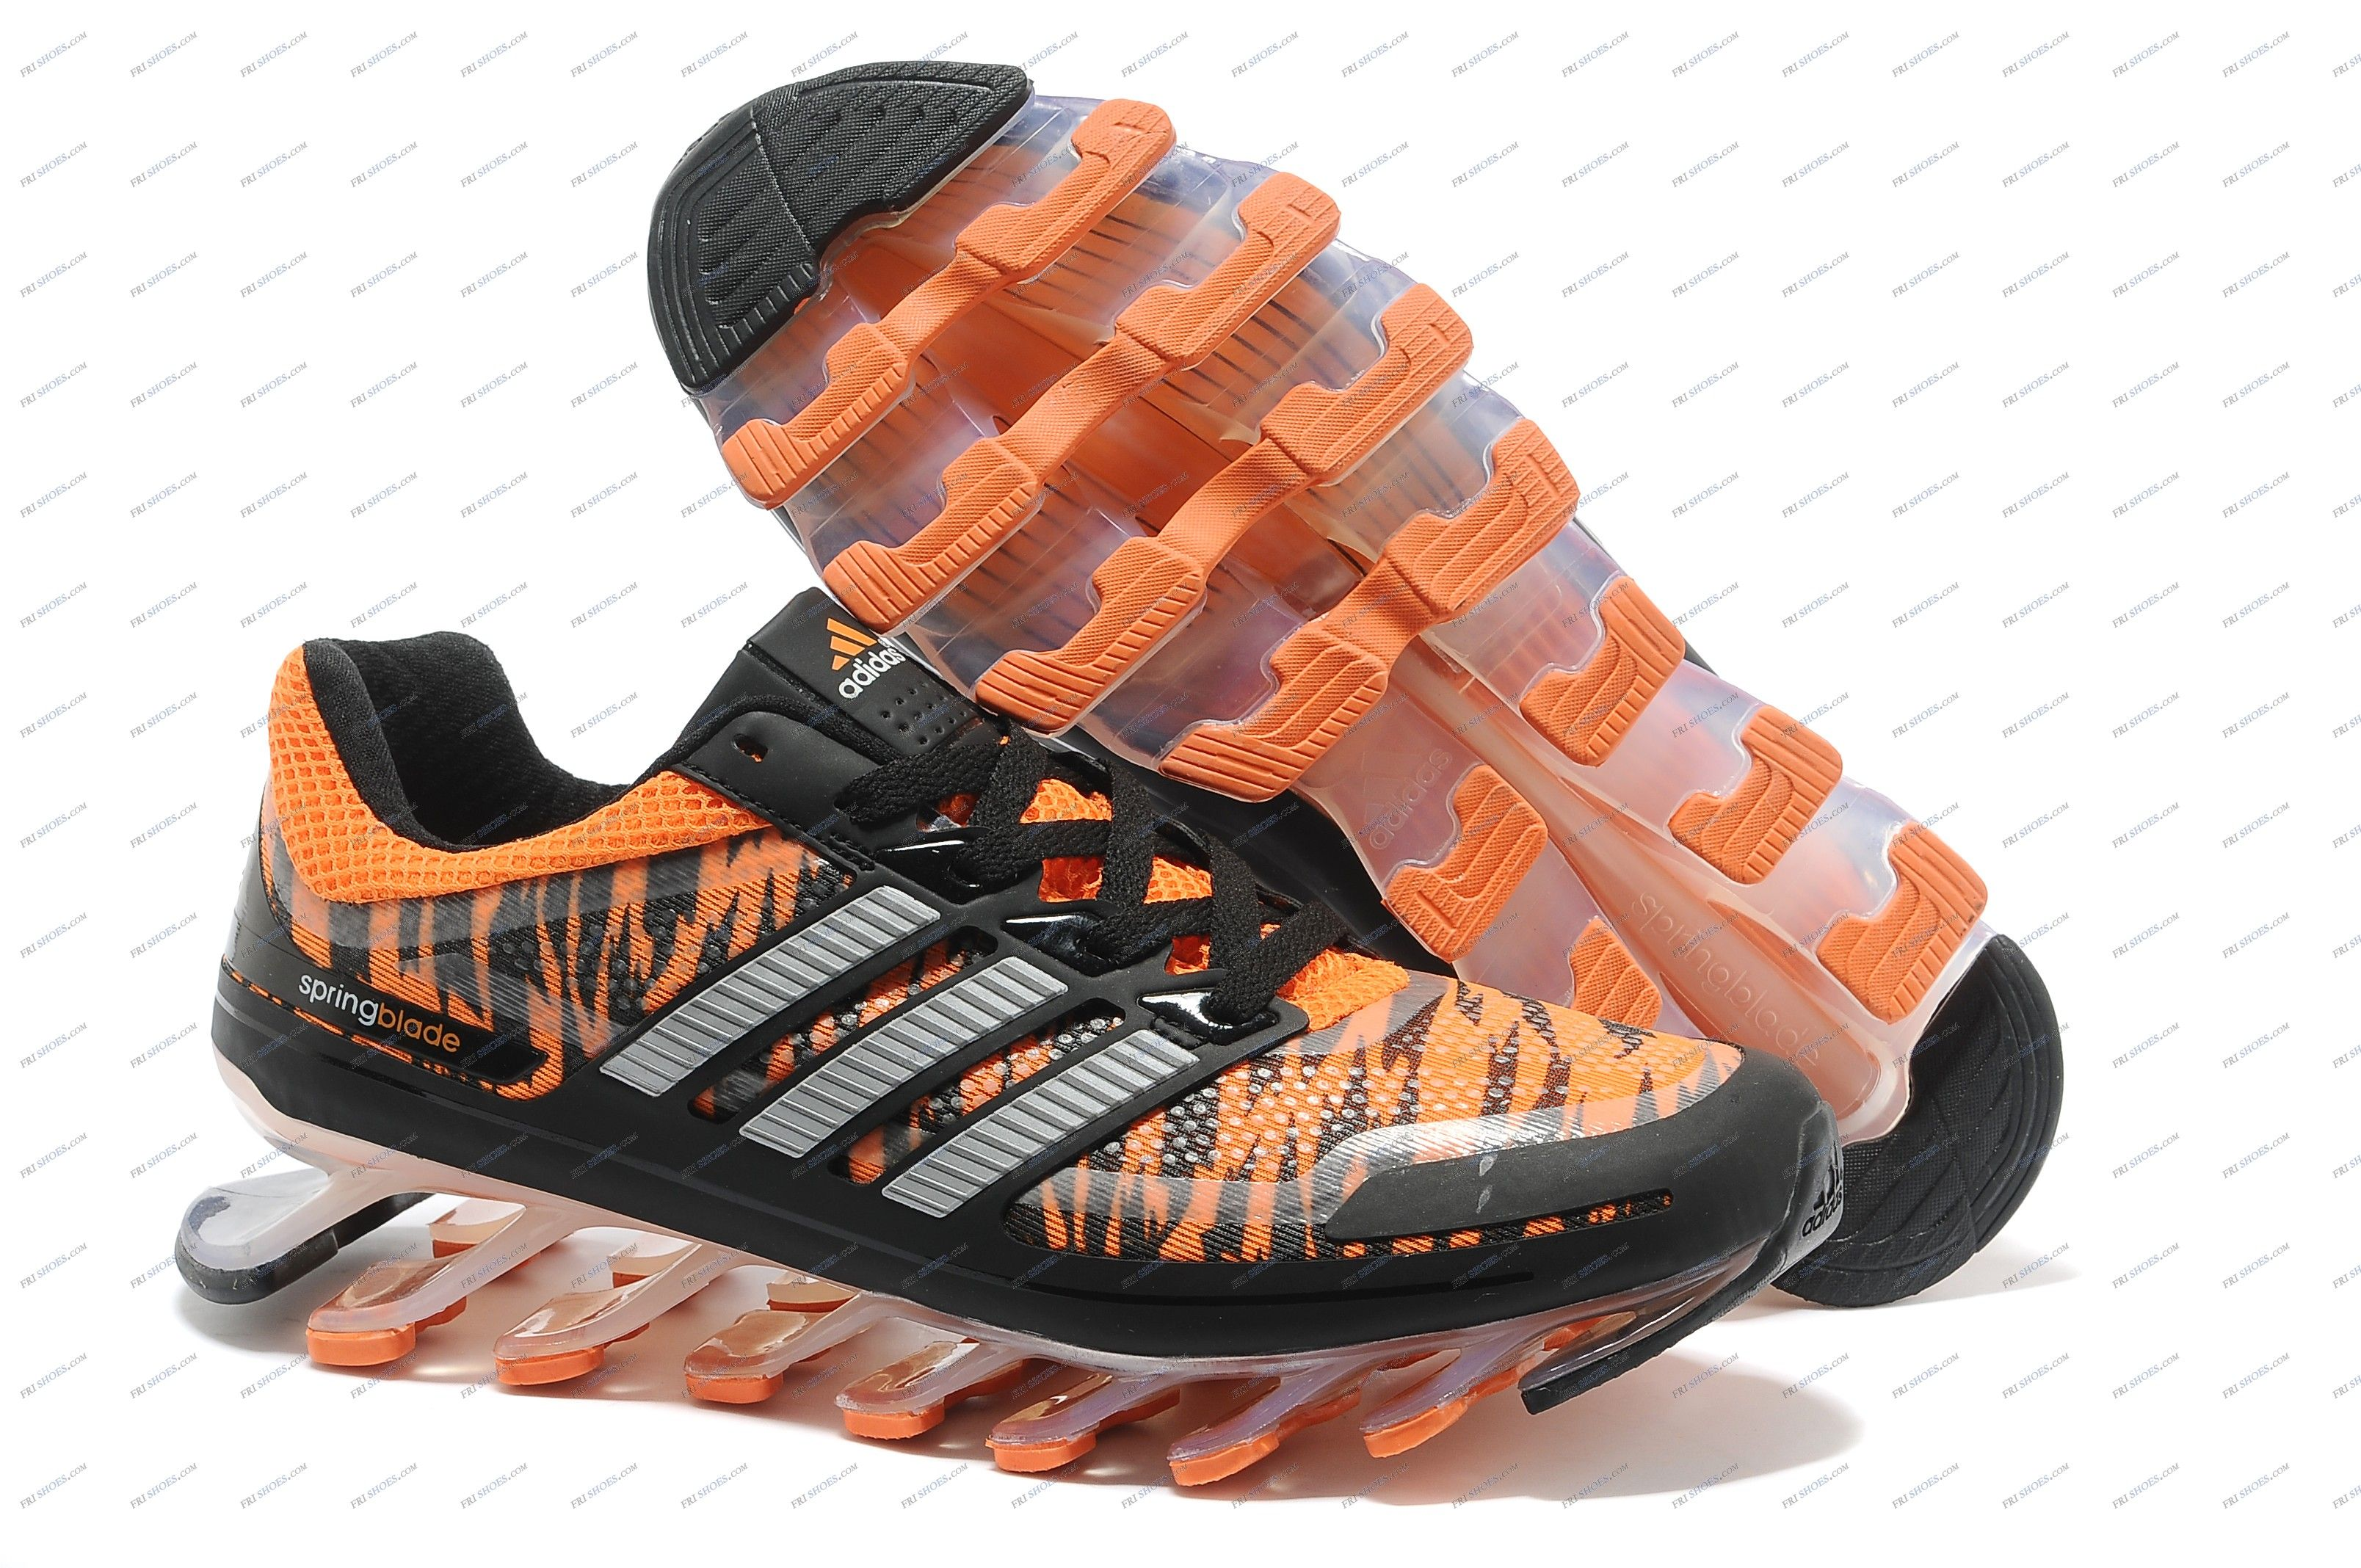 adidas springblades trainers nz